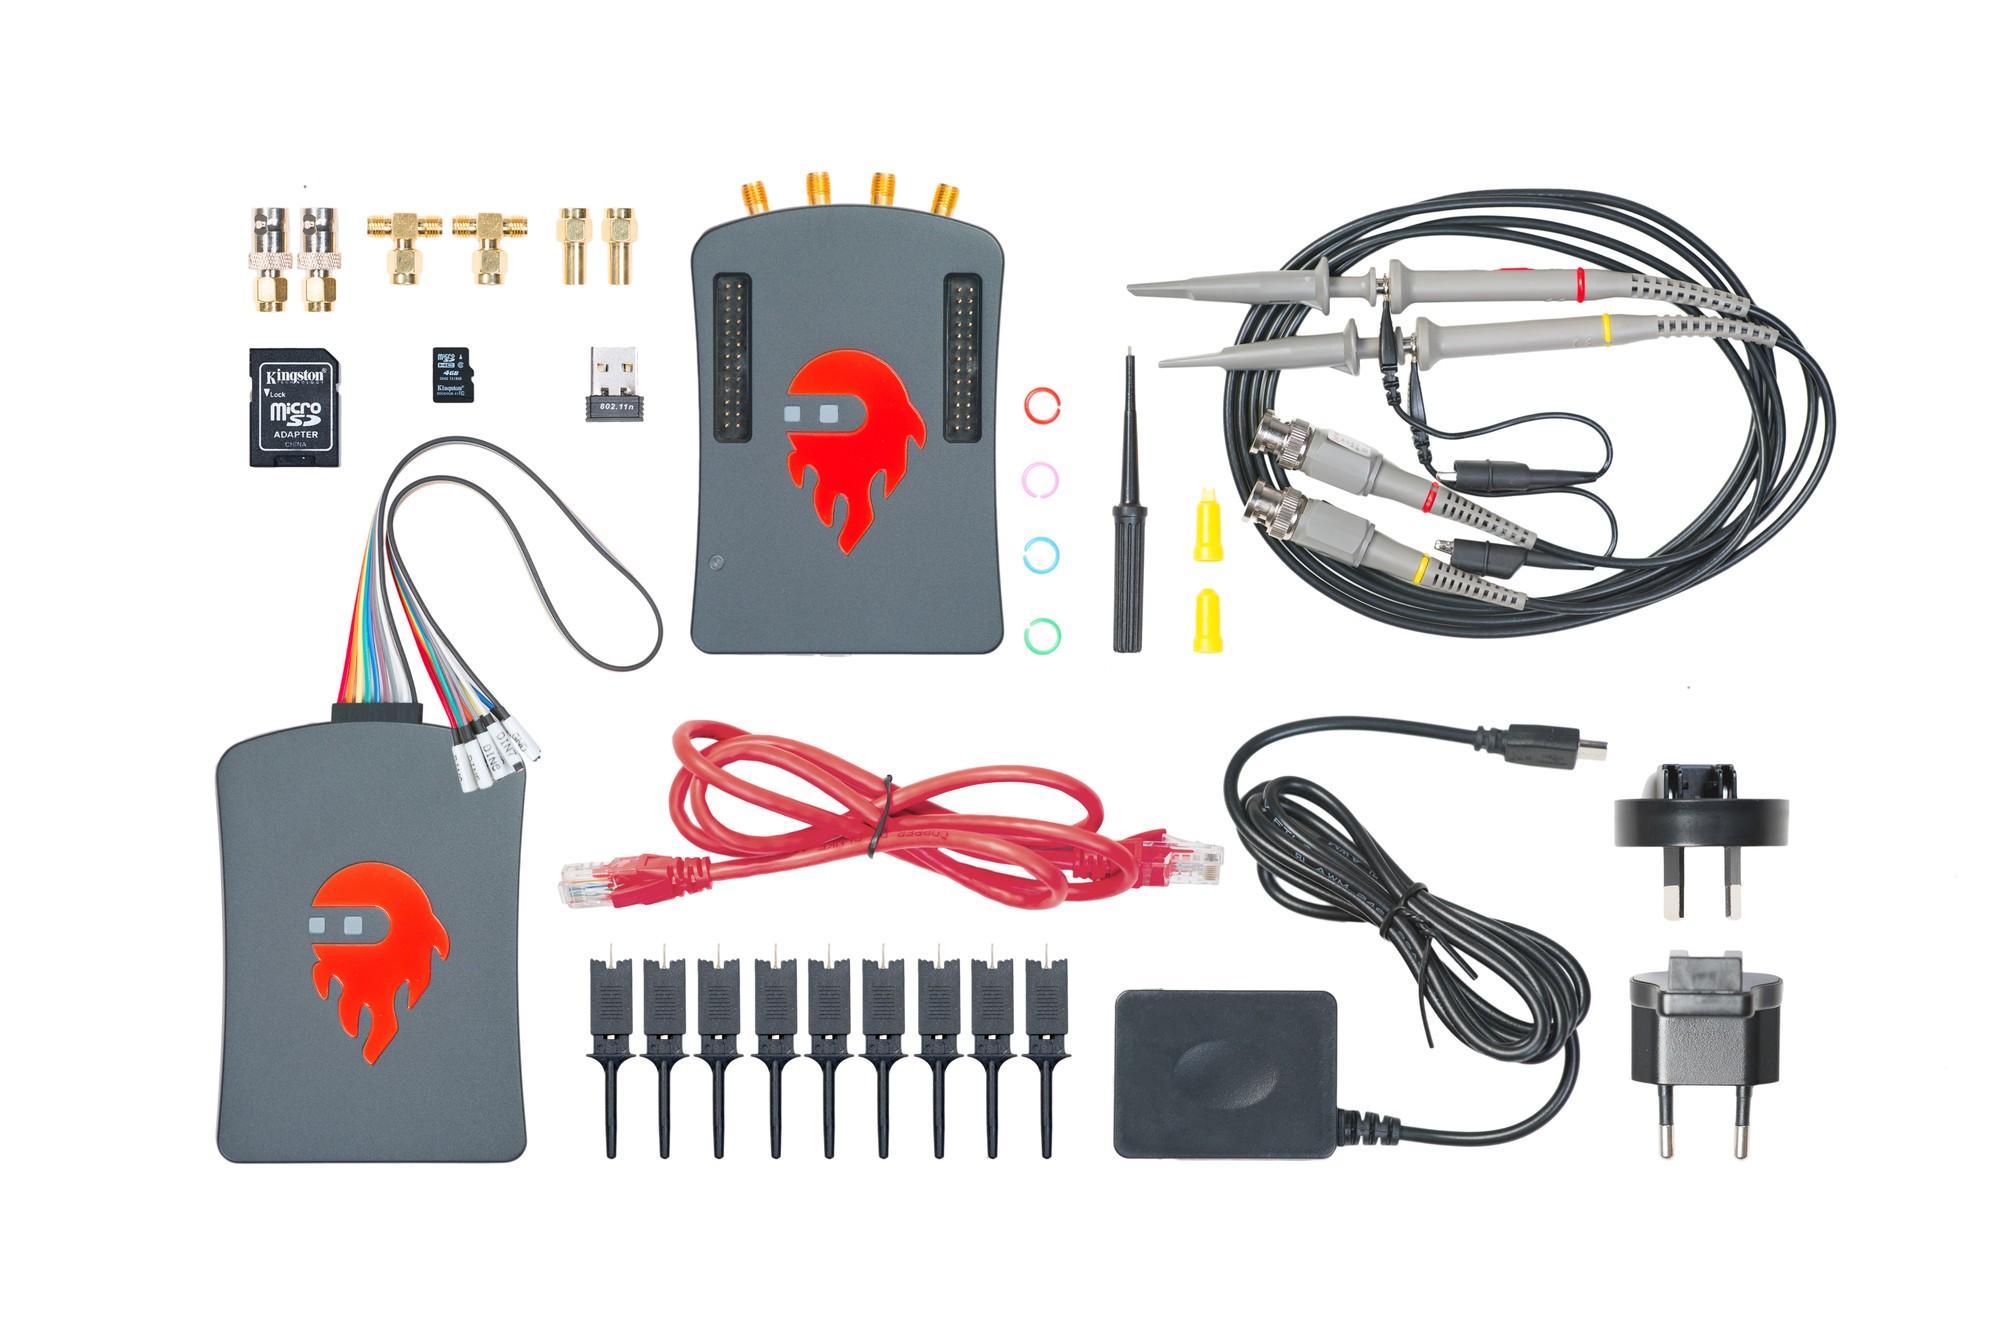 Red Pitaya V1.1 (Diagnostic Kit)